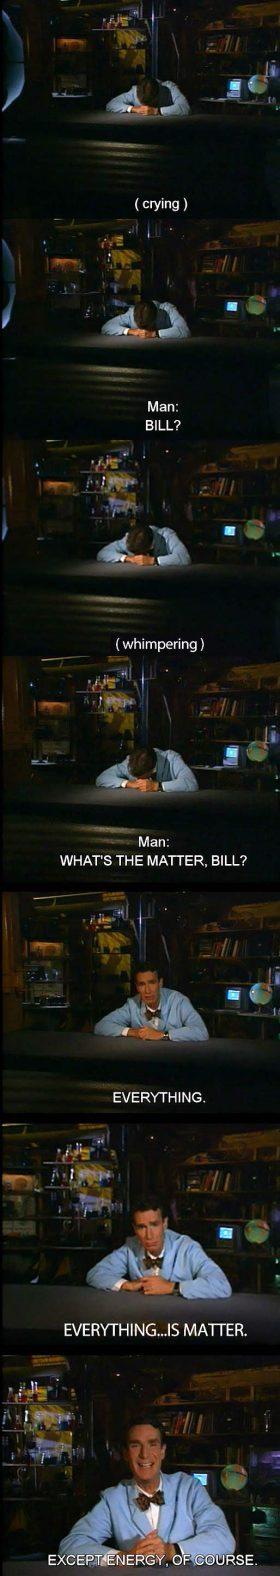 Epic Bill Nye